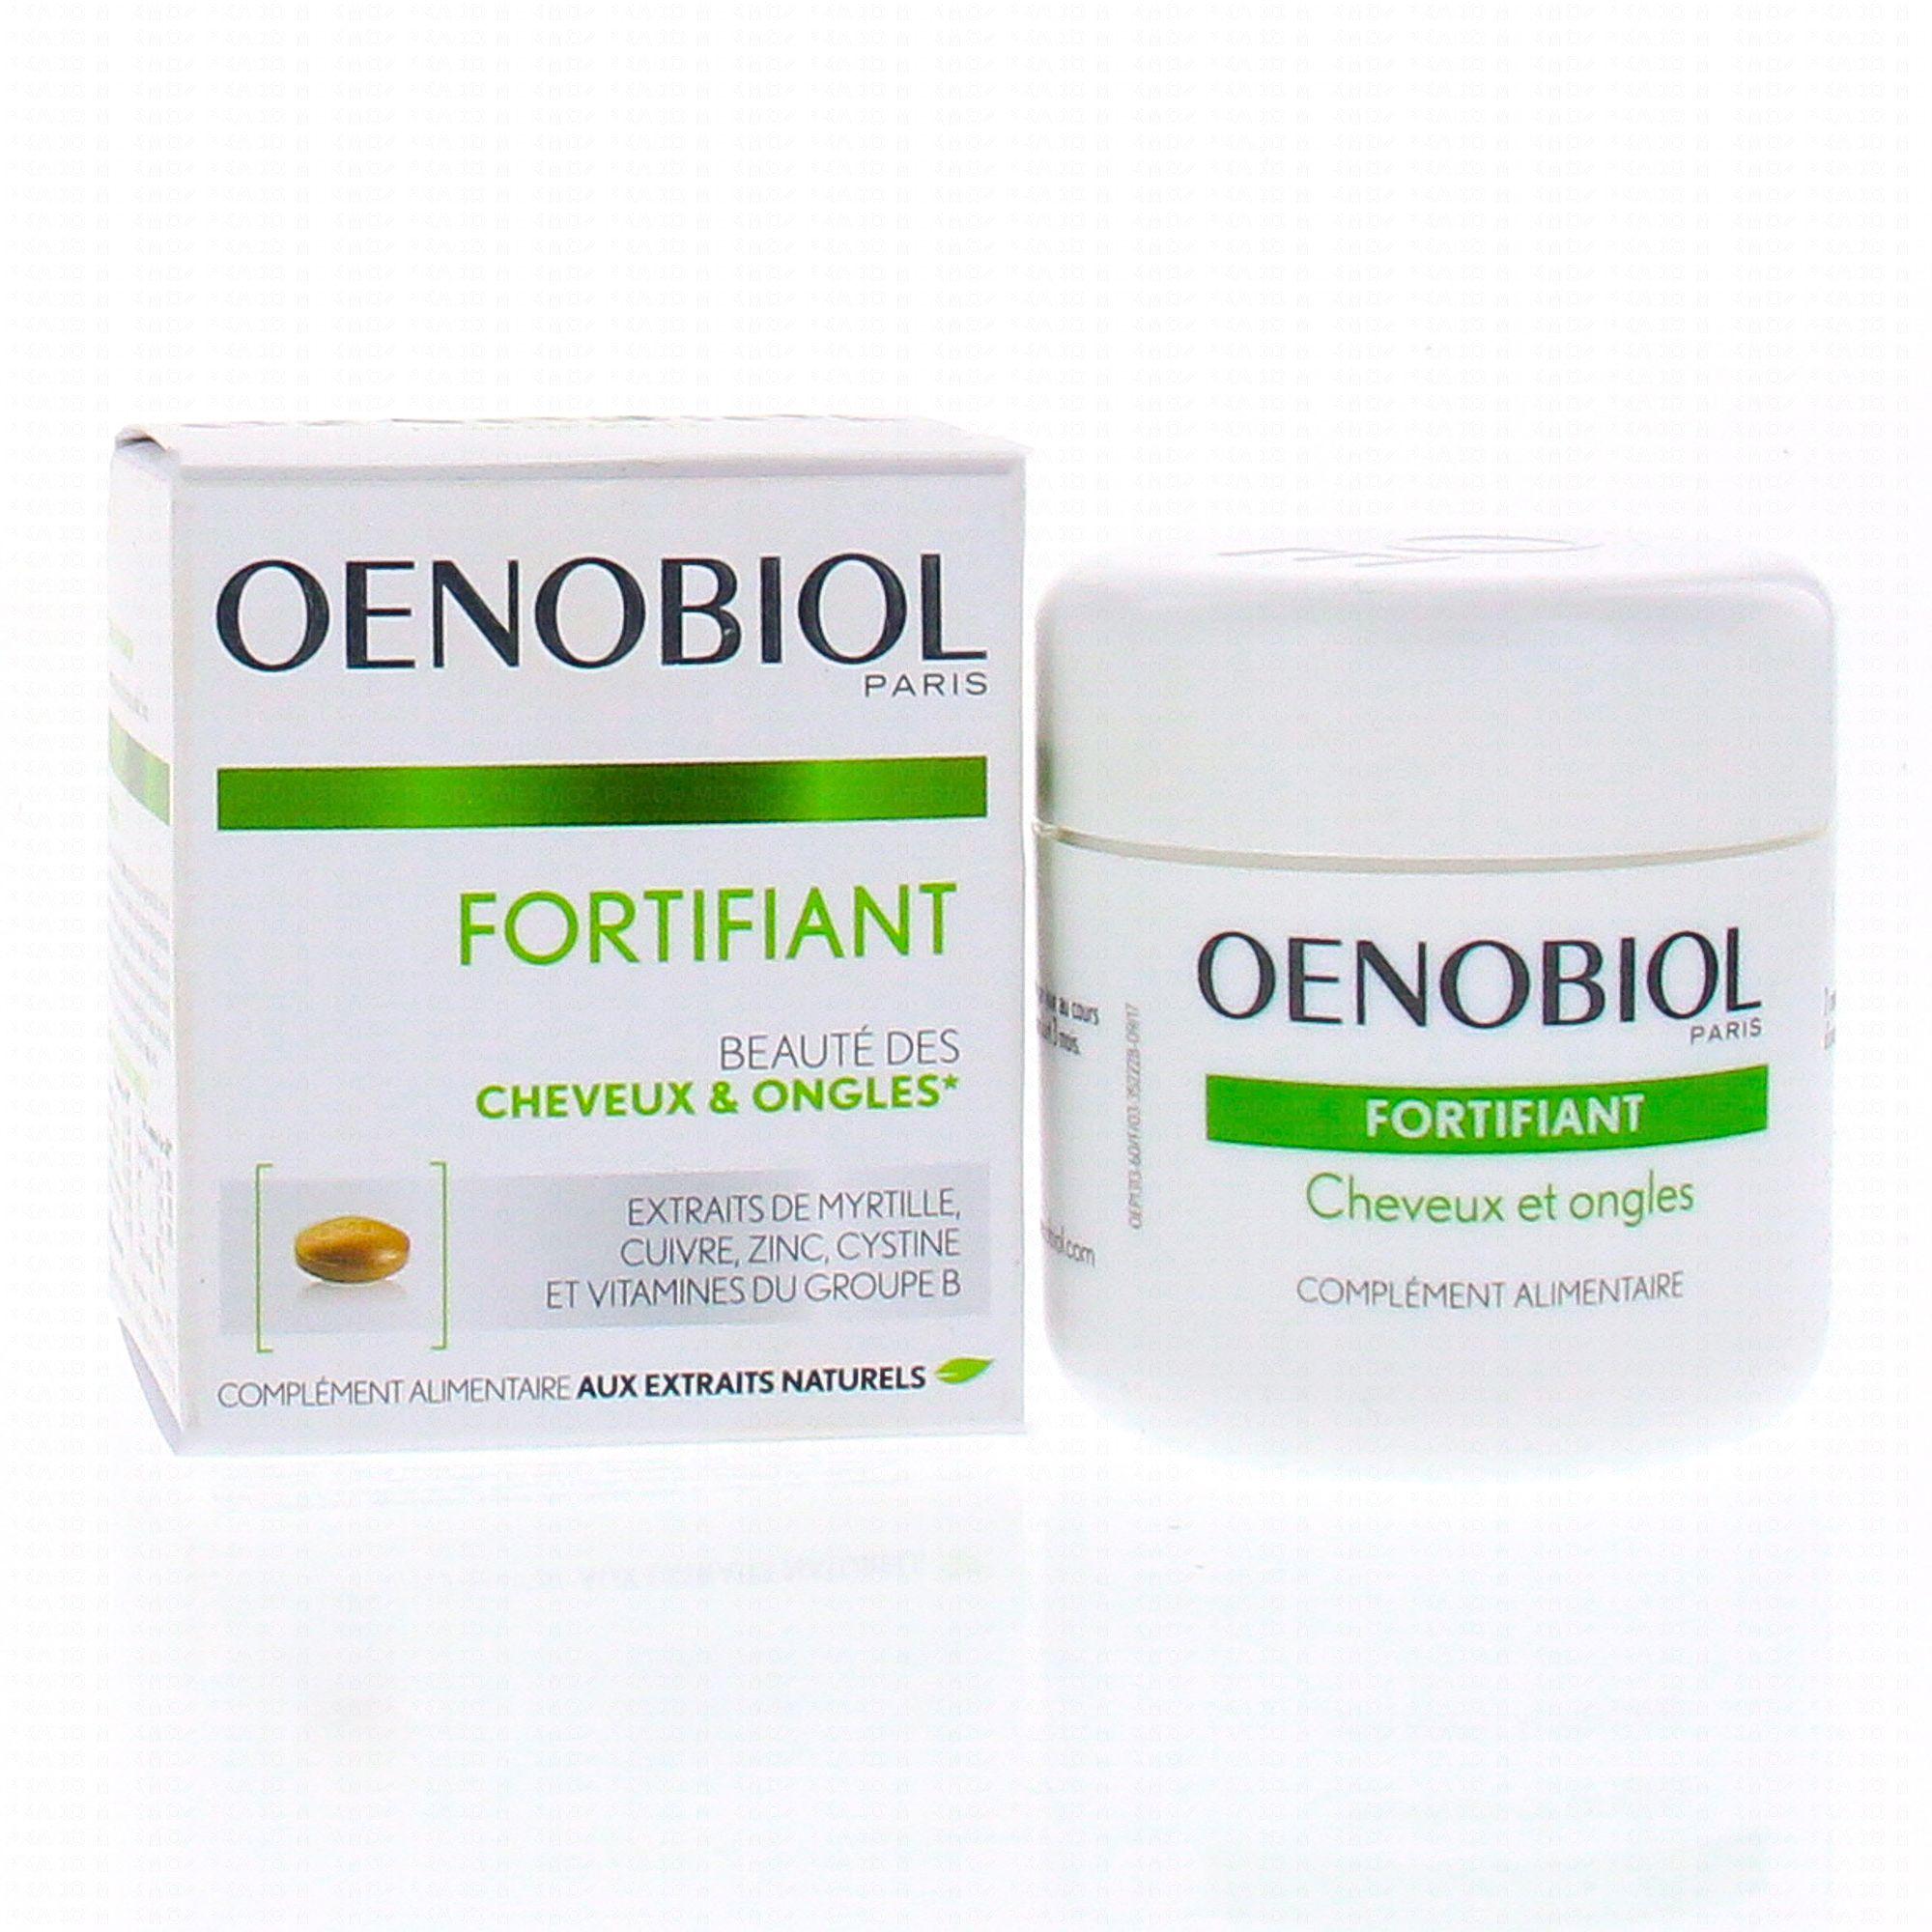 Oenobiol Fortifiant Cheveux Et Ongles 60 Comprimes Parapharmacie